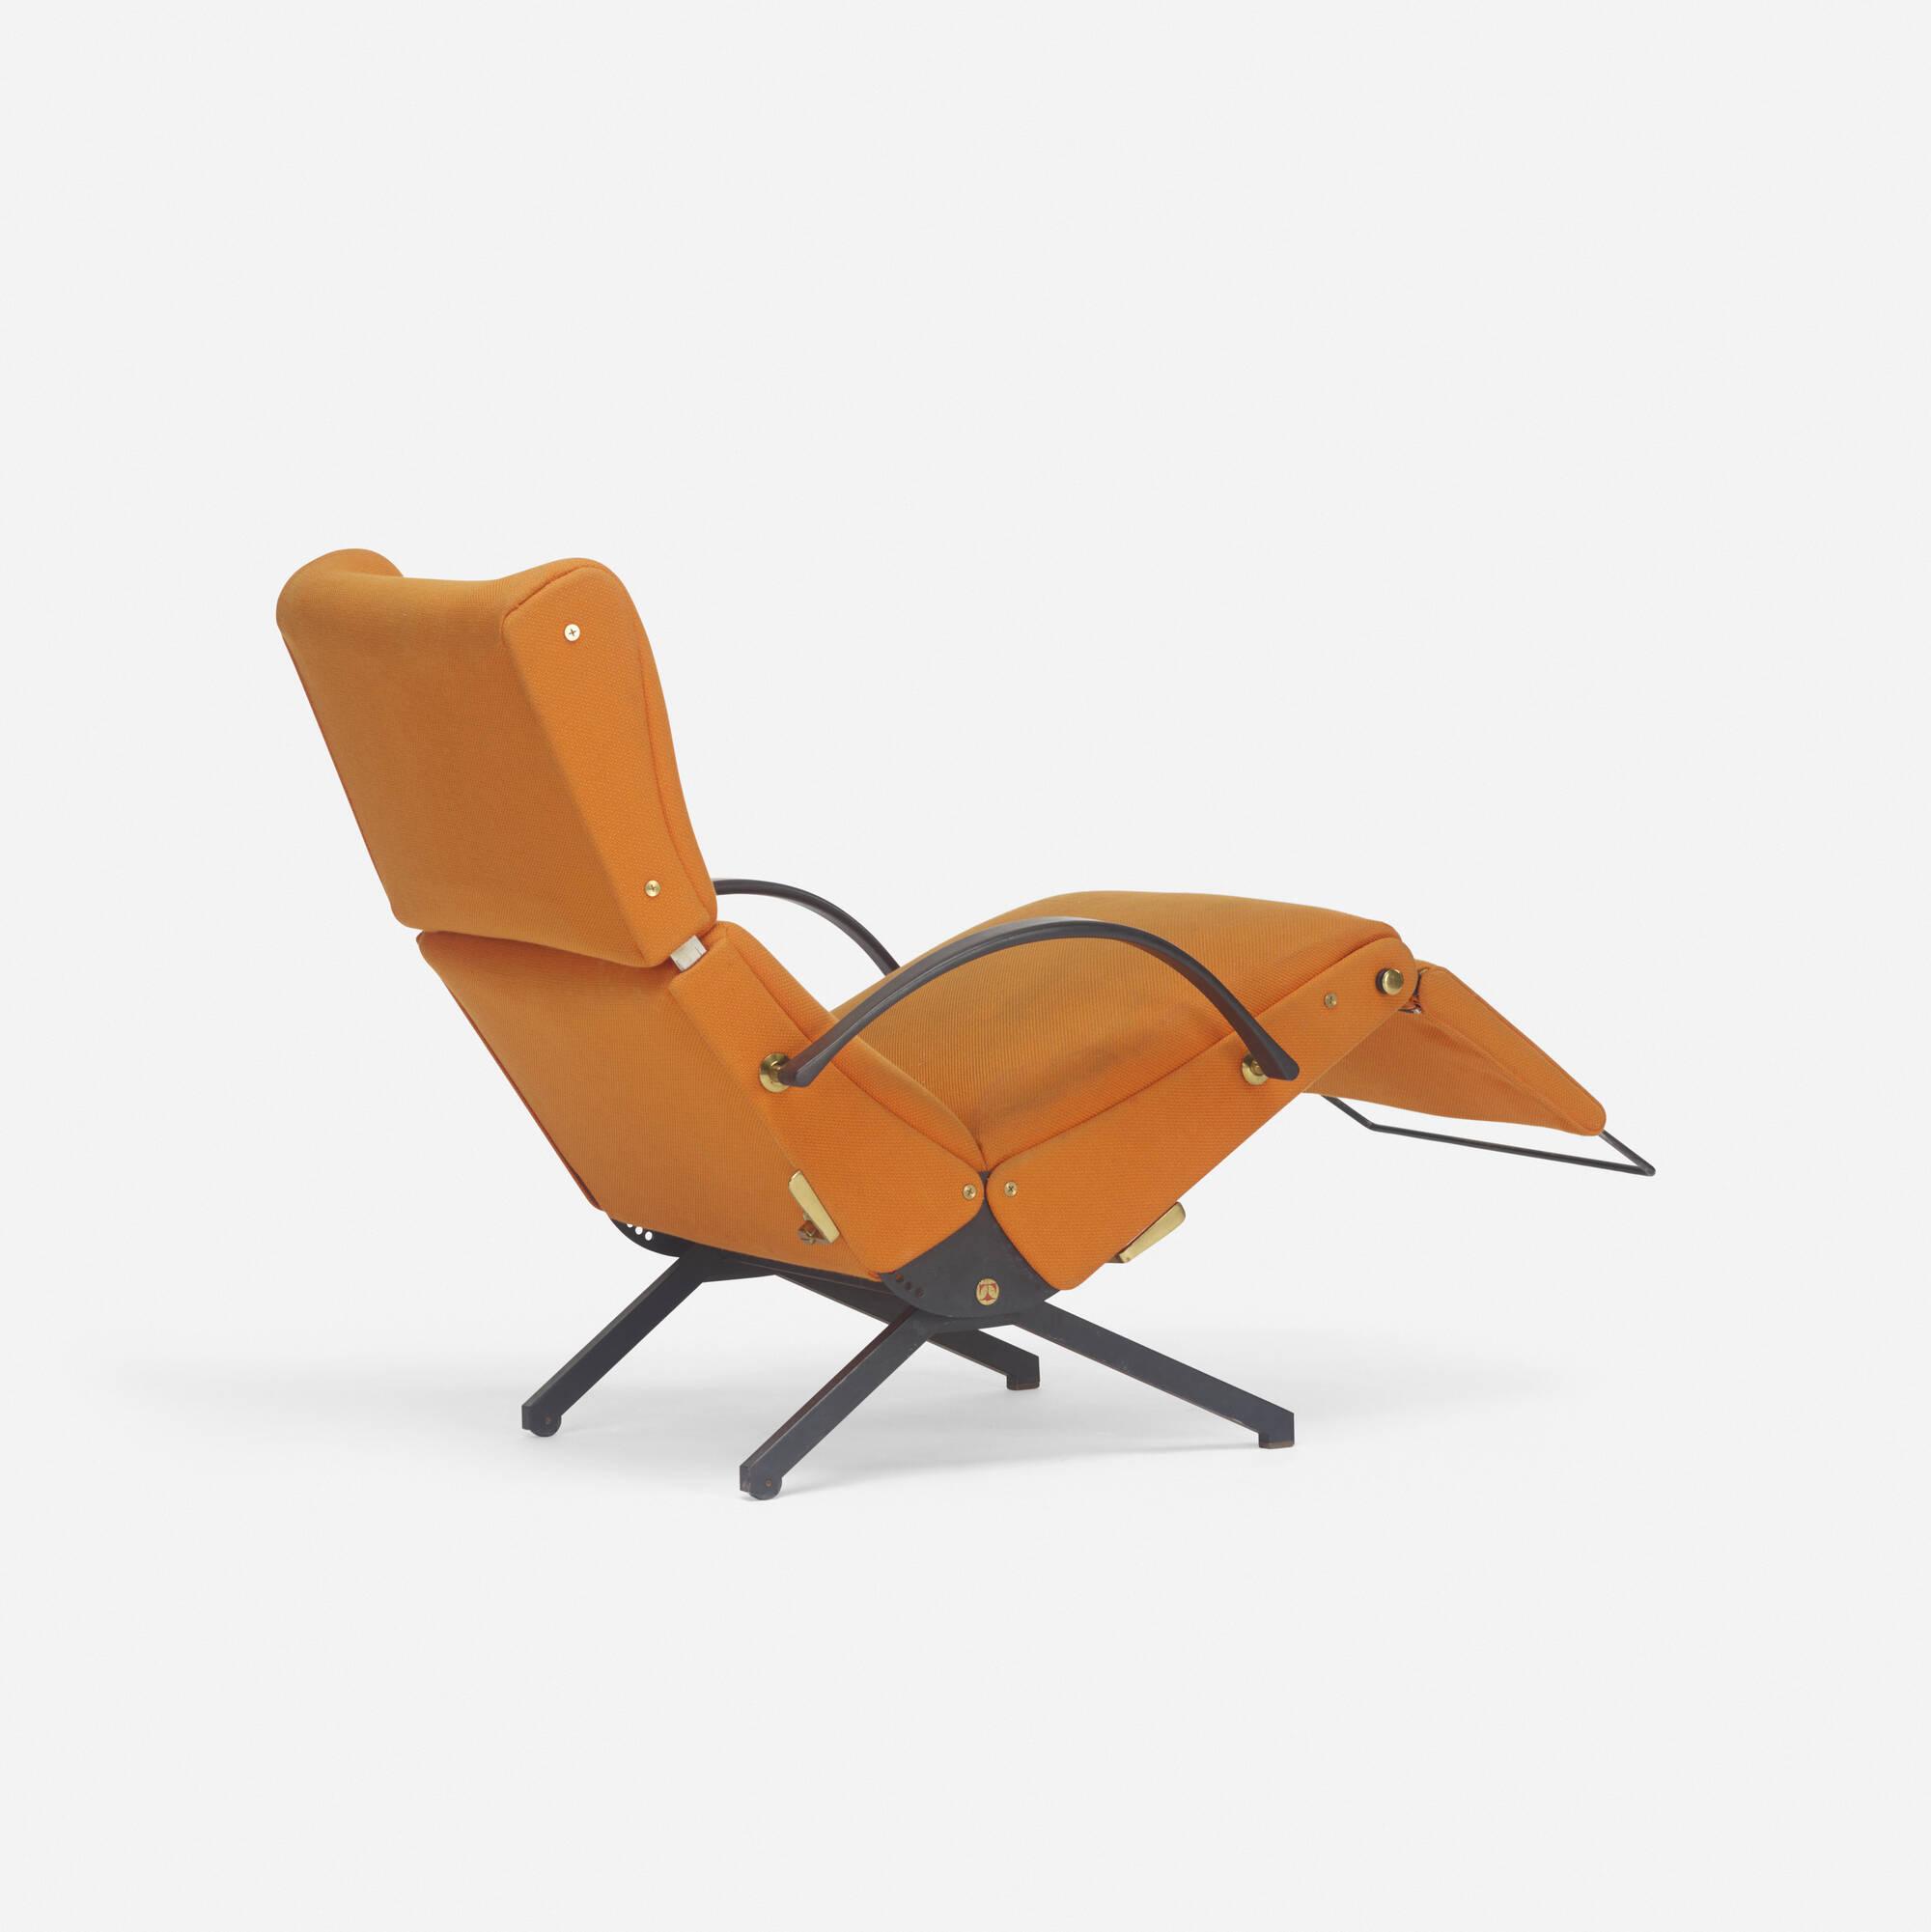 310: Osvaldo Borsani / P40 lounge chair (2 of 2)